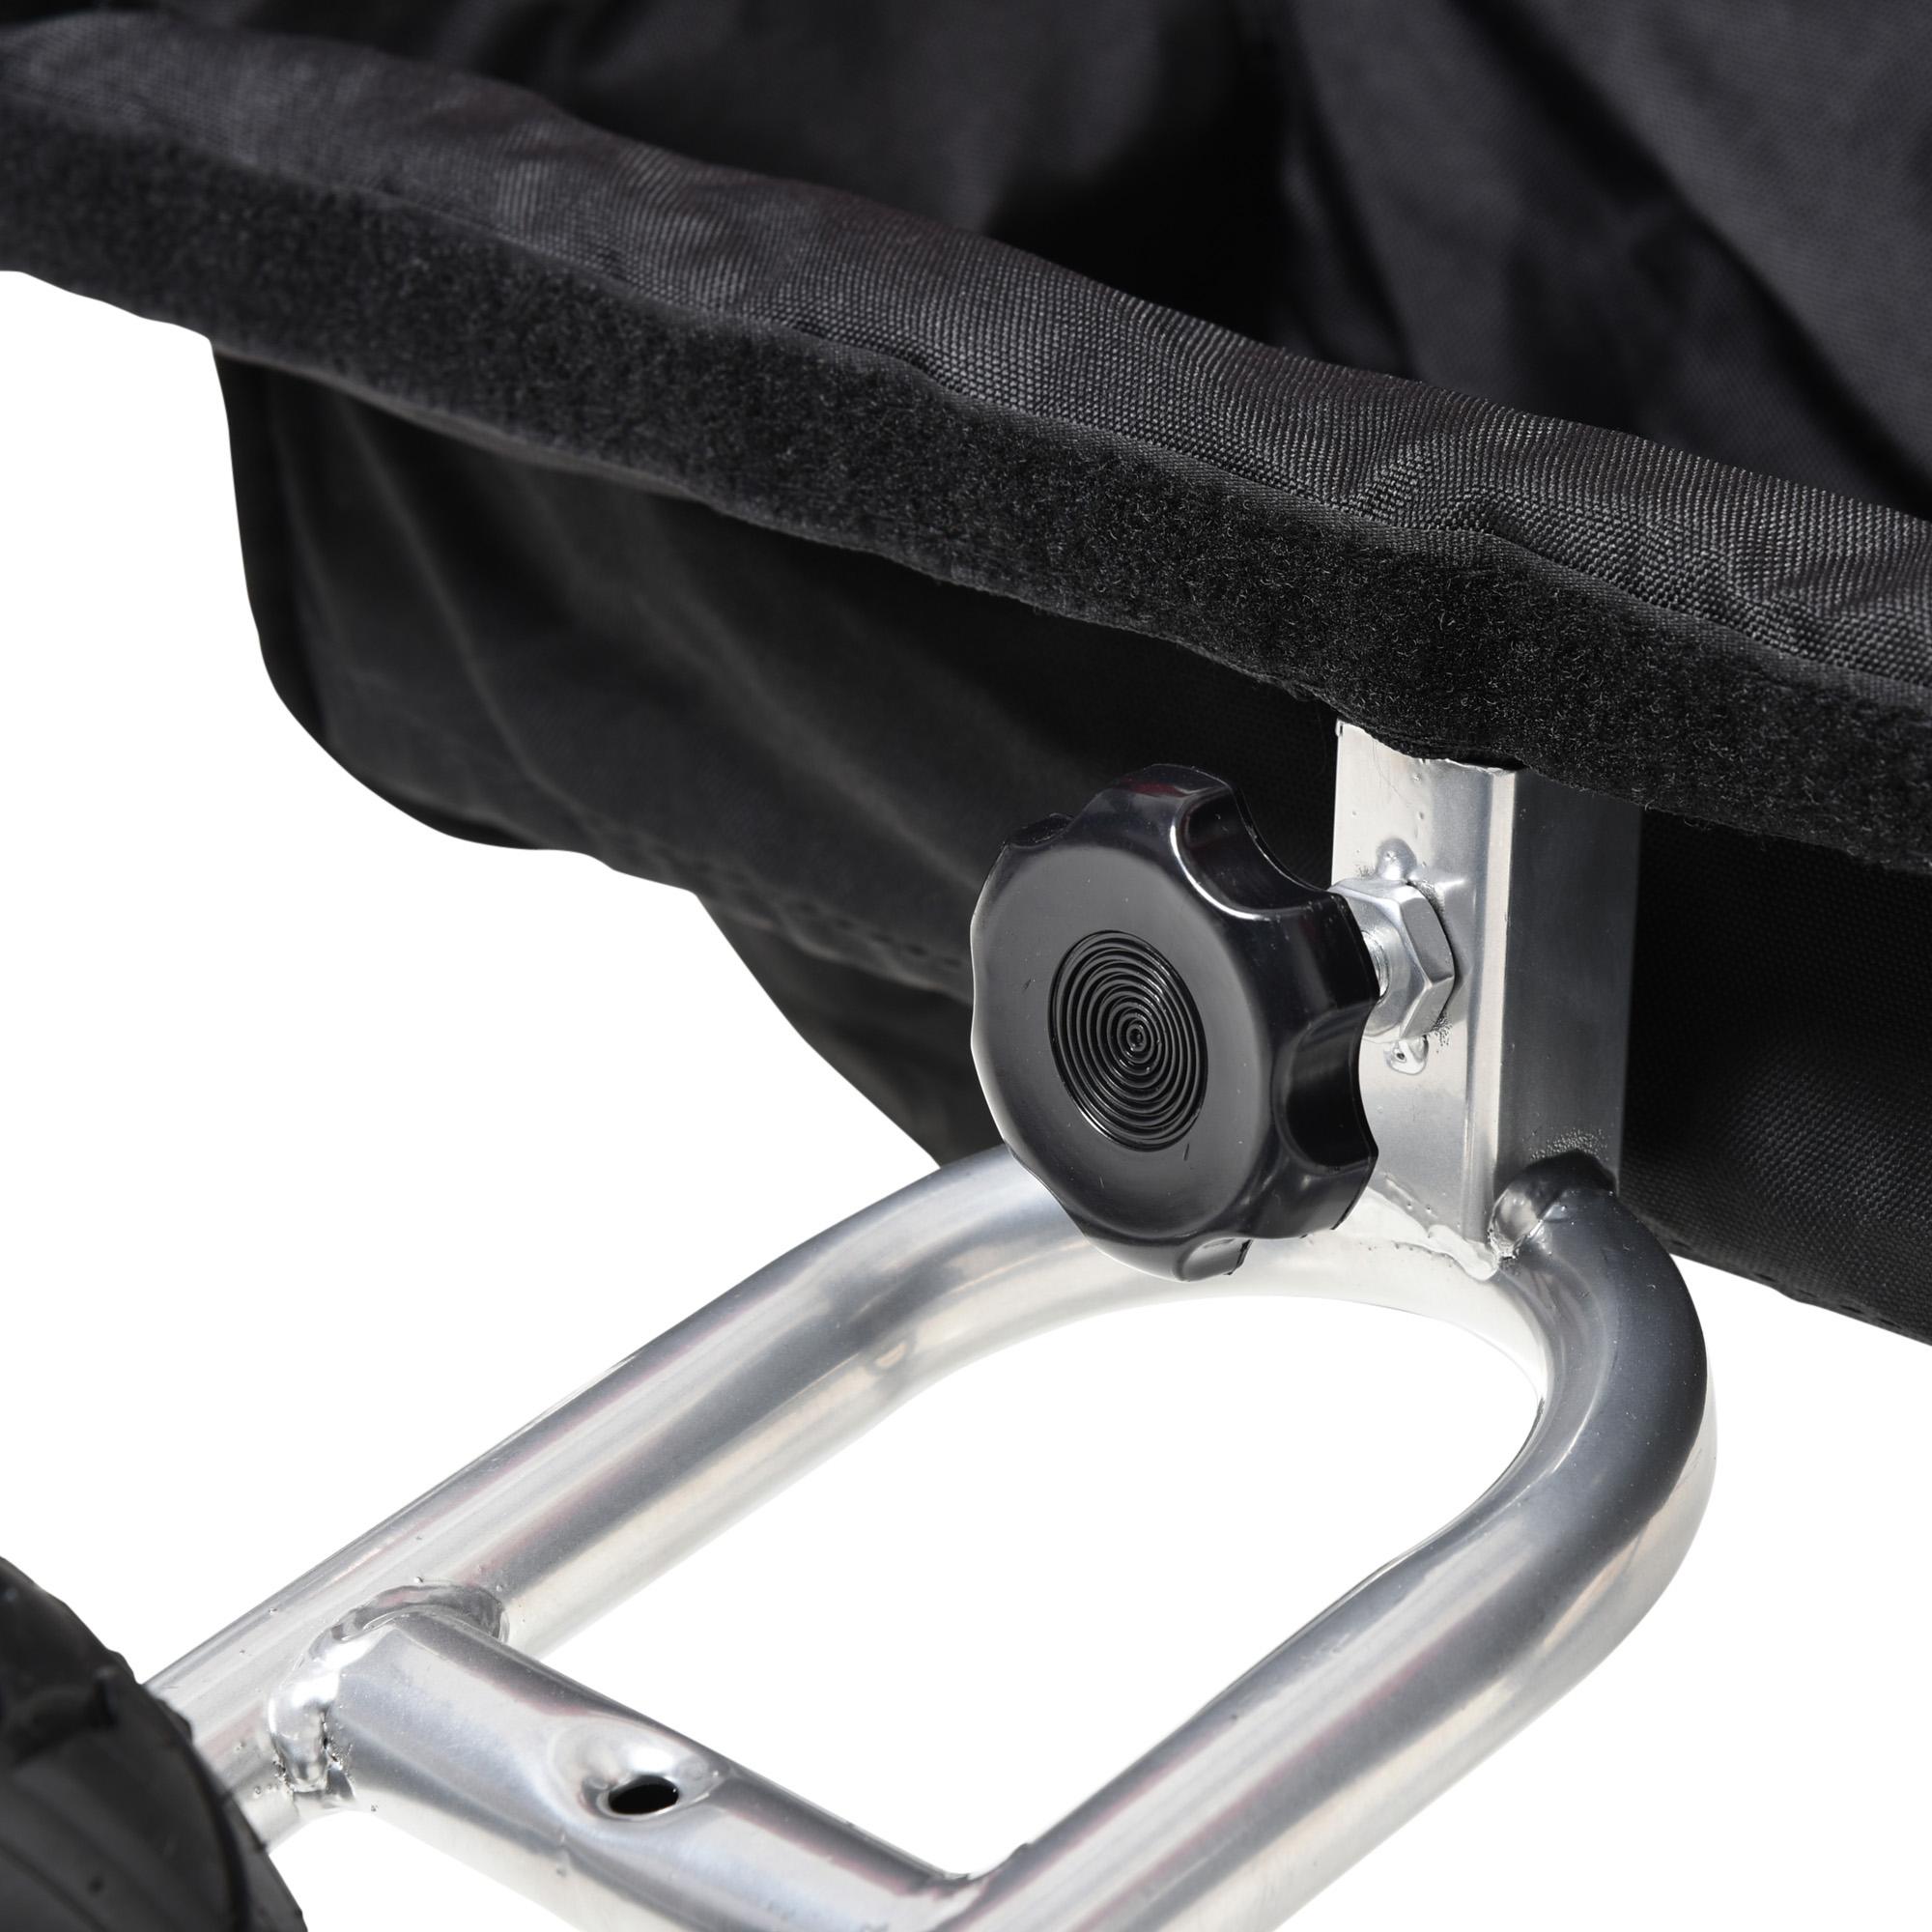 miniatura 32 - Remolque Bicicleta Niño 2 PLAZAS+Amortiguador Kit Footing Freno Bandera Cubierta